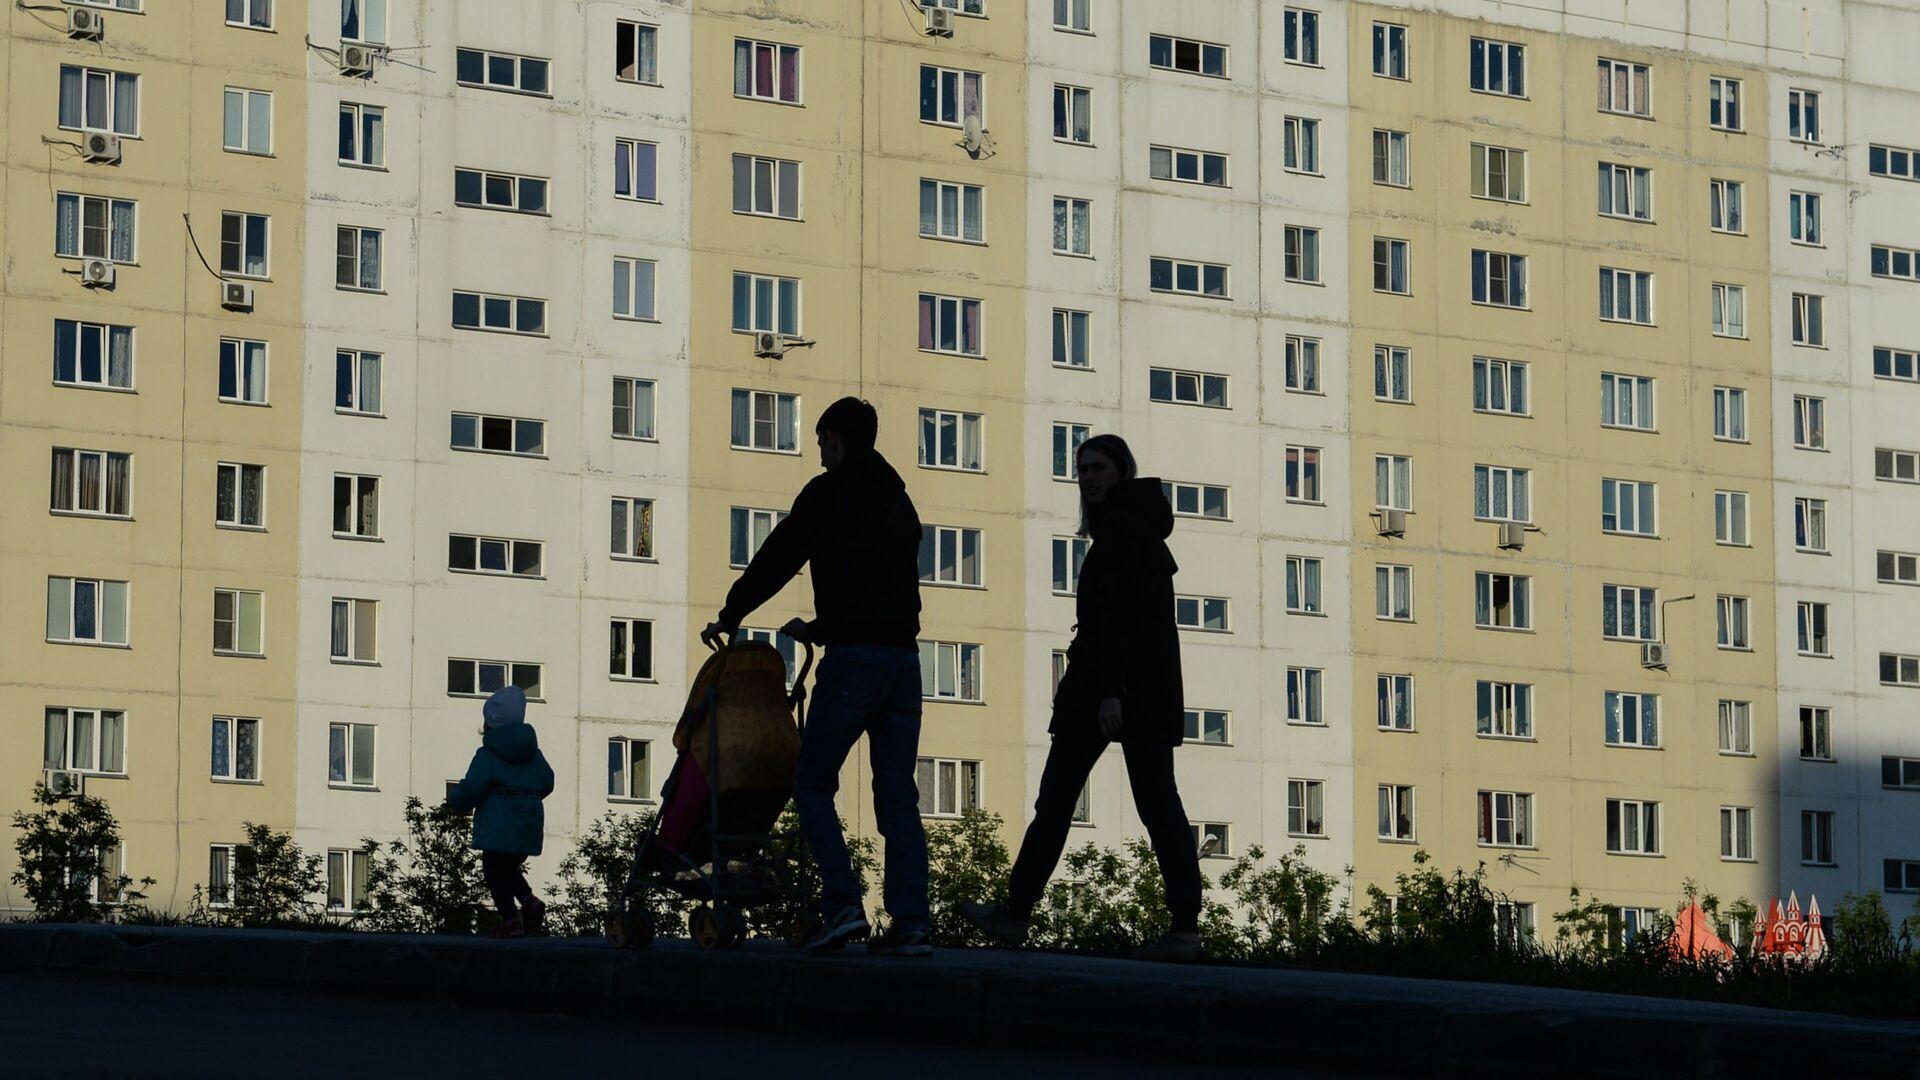 Семья во дворе жилого дома - РИА Новости, 1920, 09.12.2020